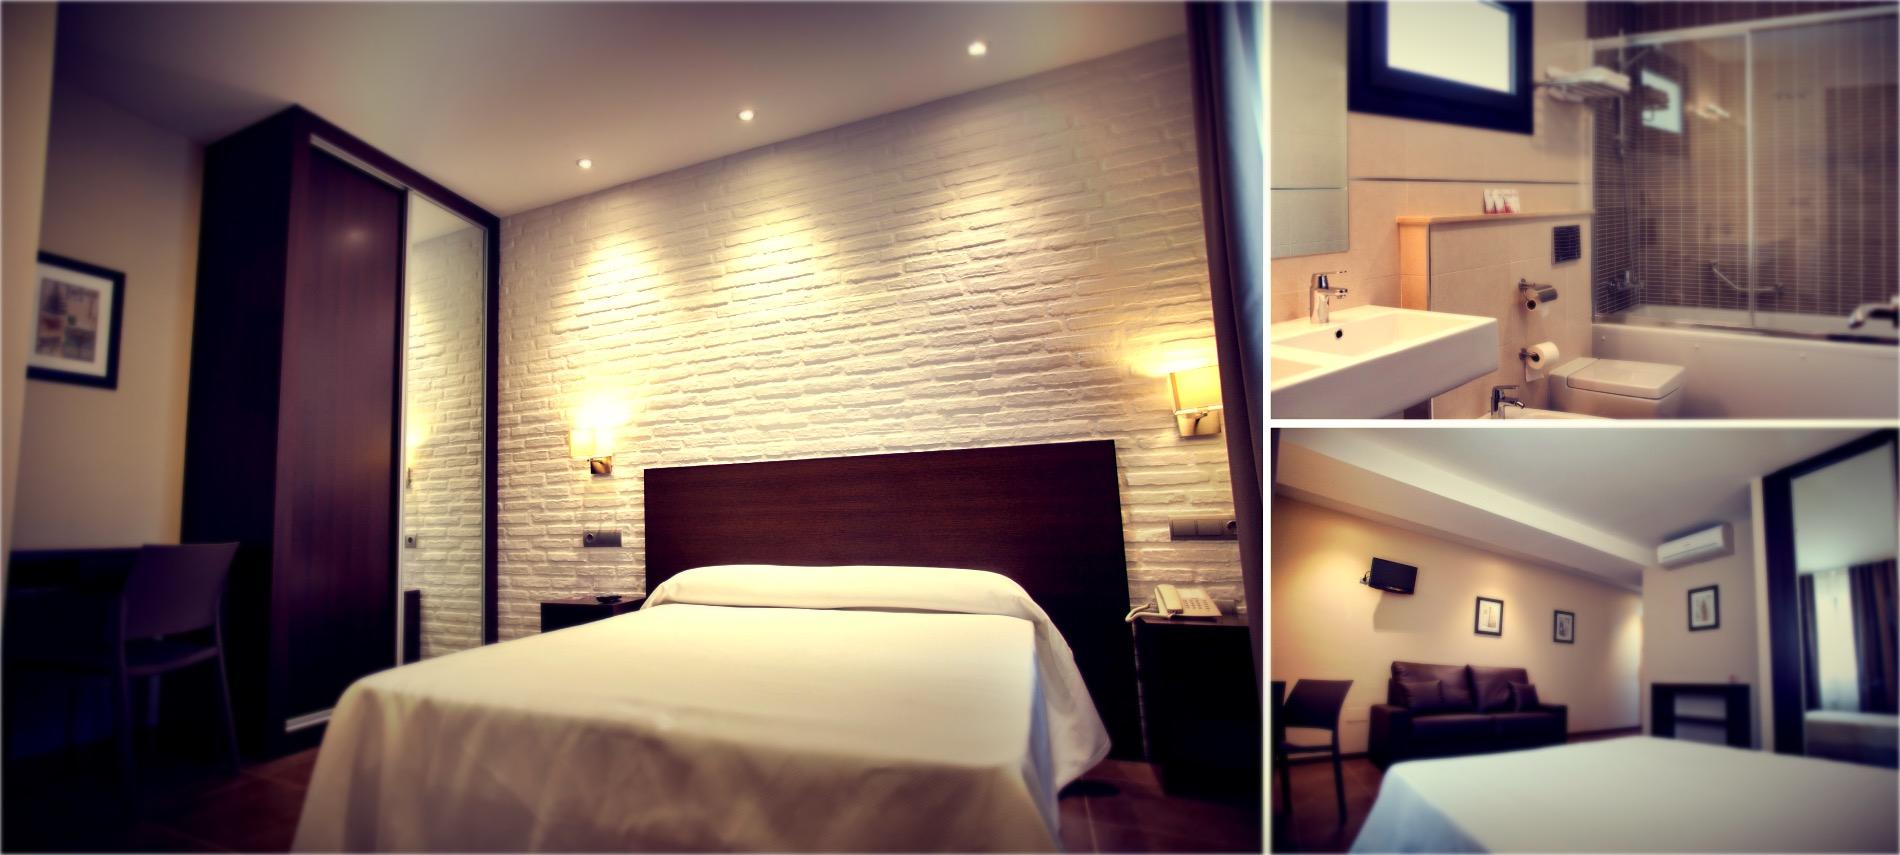 hotel-restaurante-el-corte-casabermeja-01